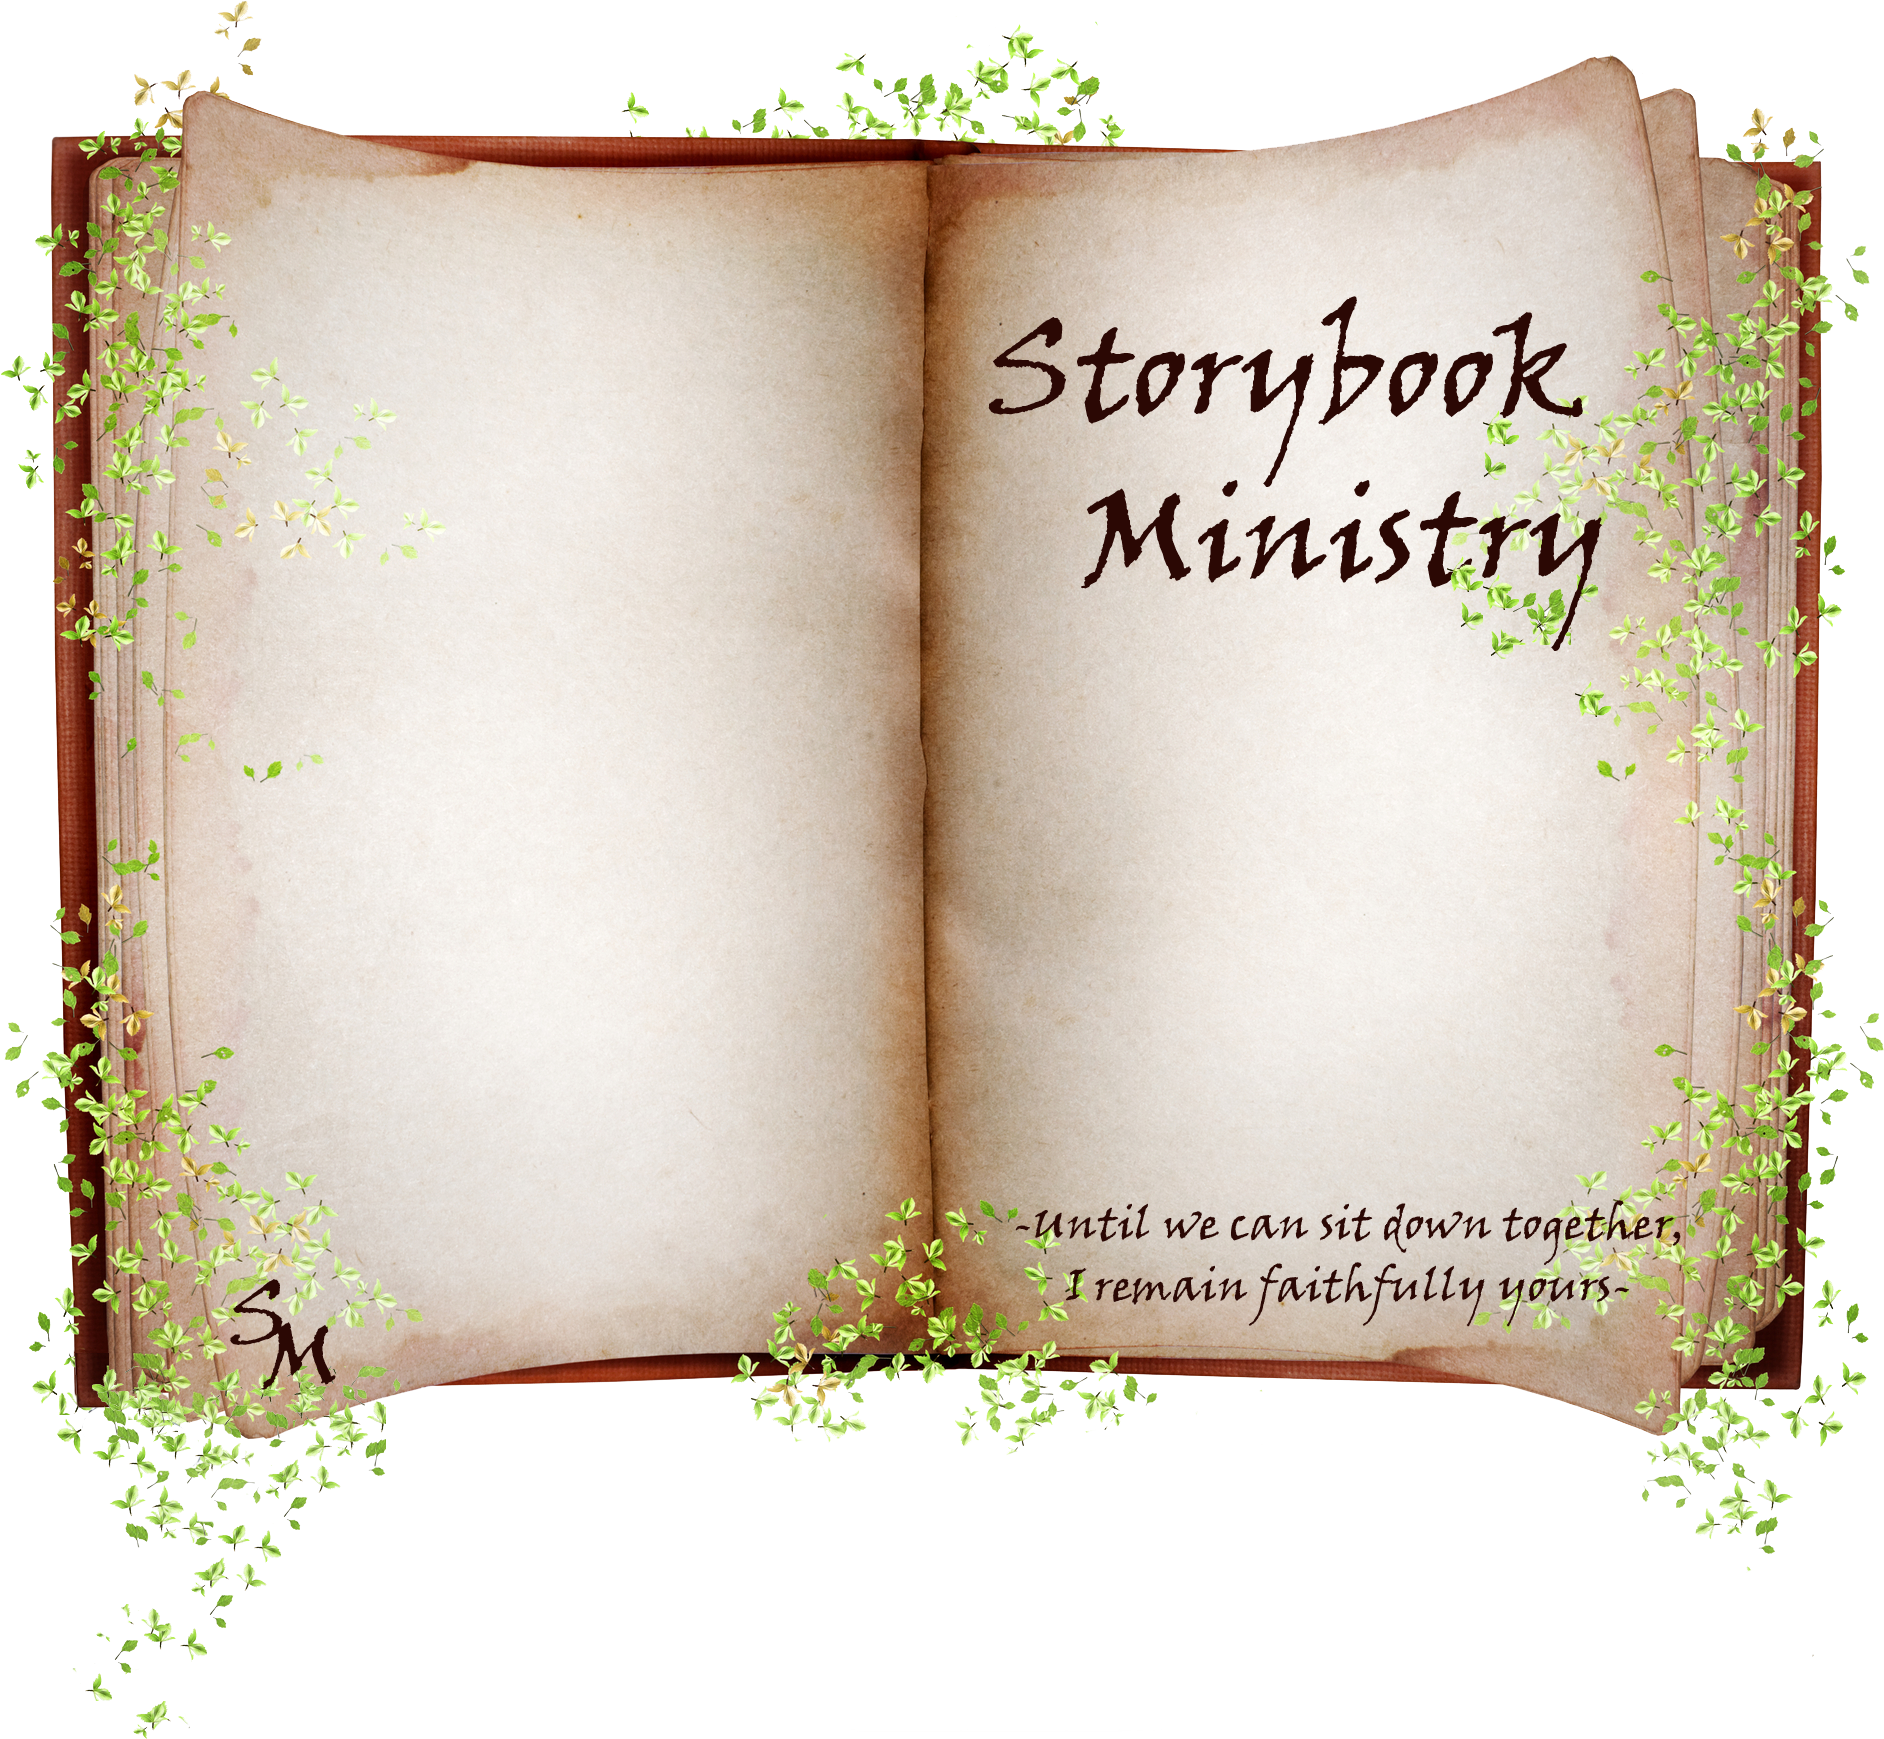 Storybook Ministry